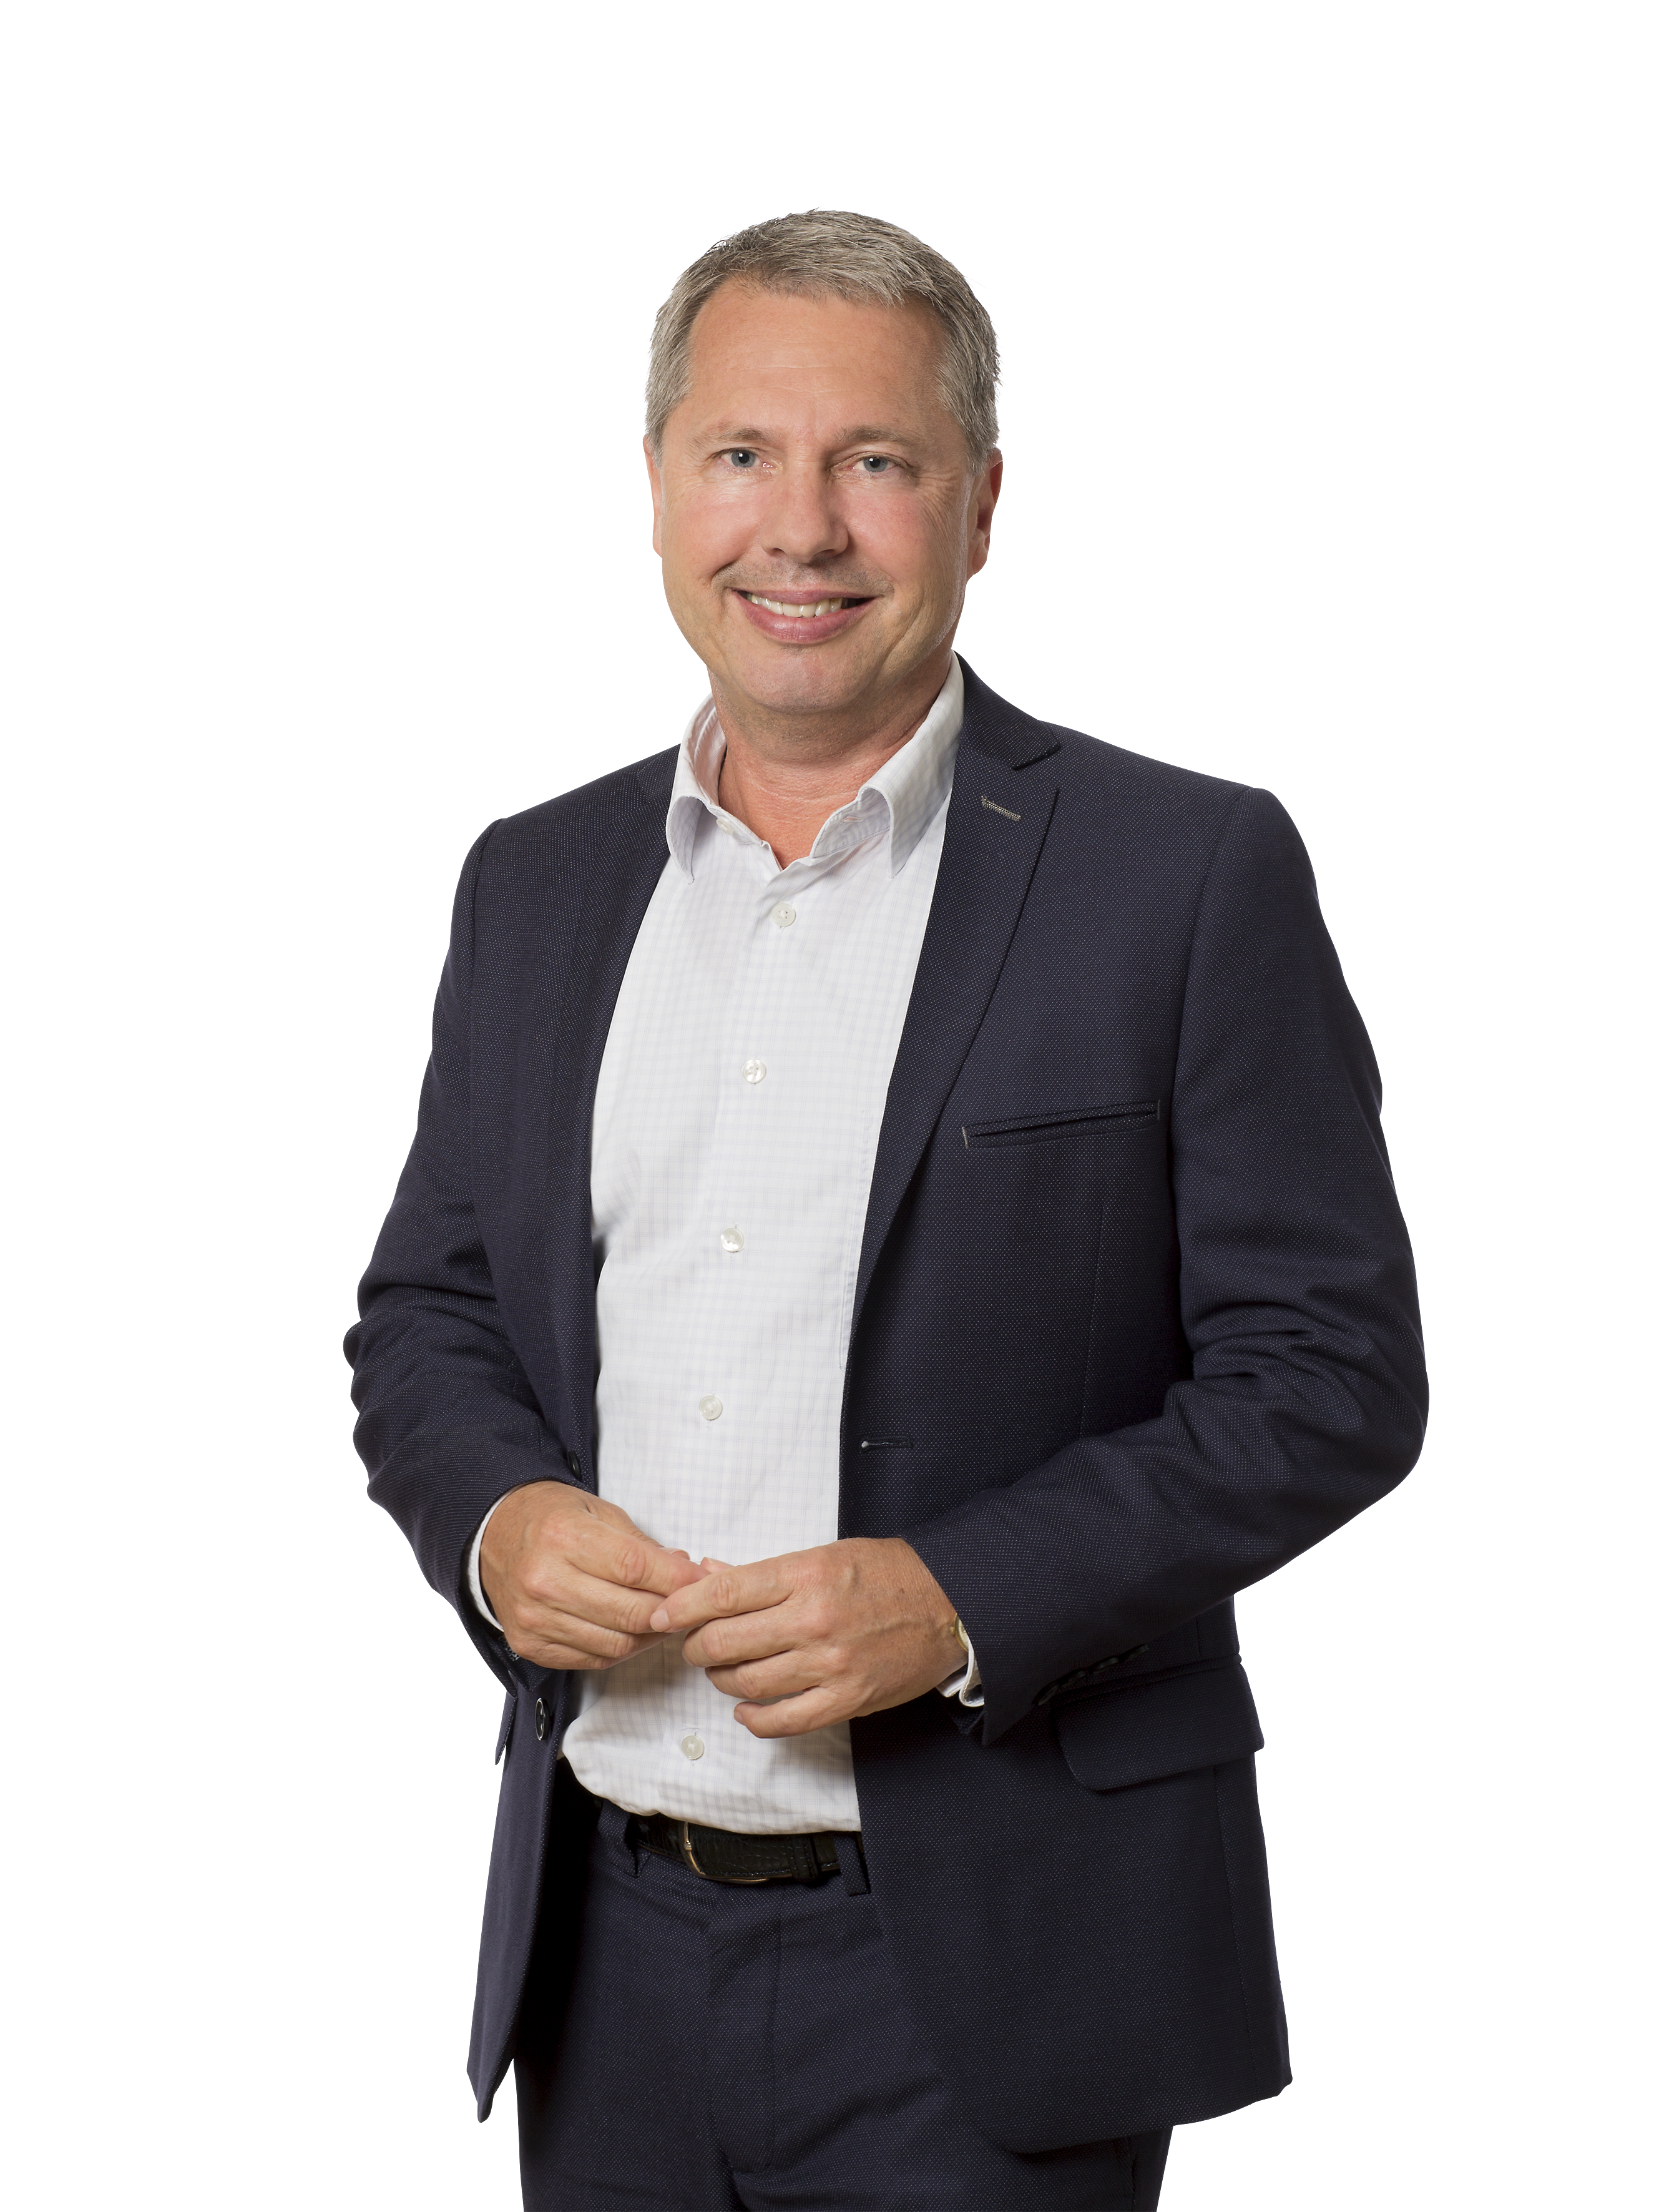 Lars Vllads Krogh